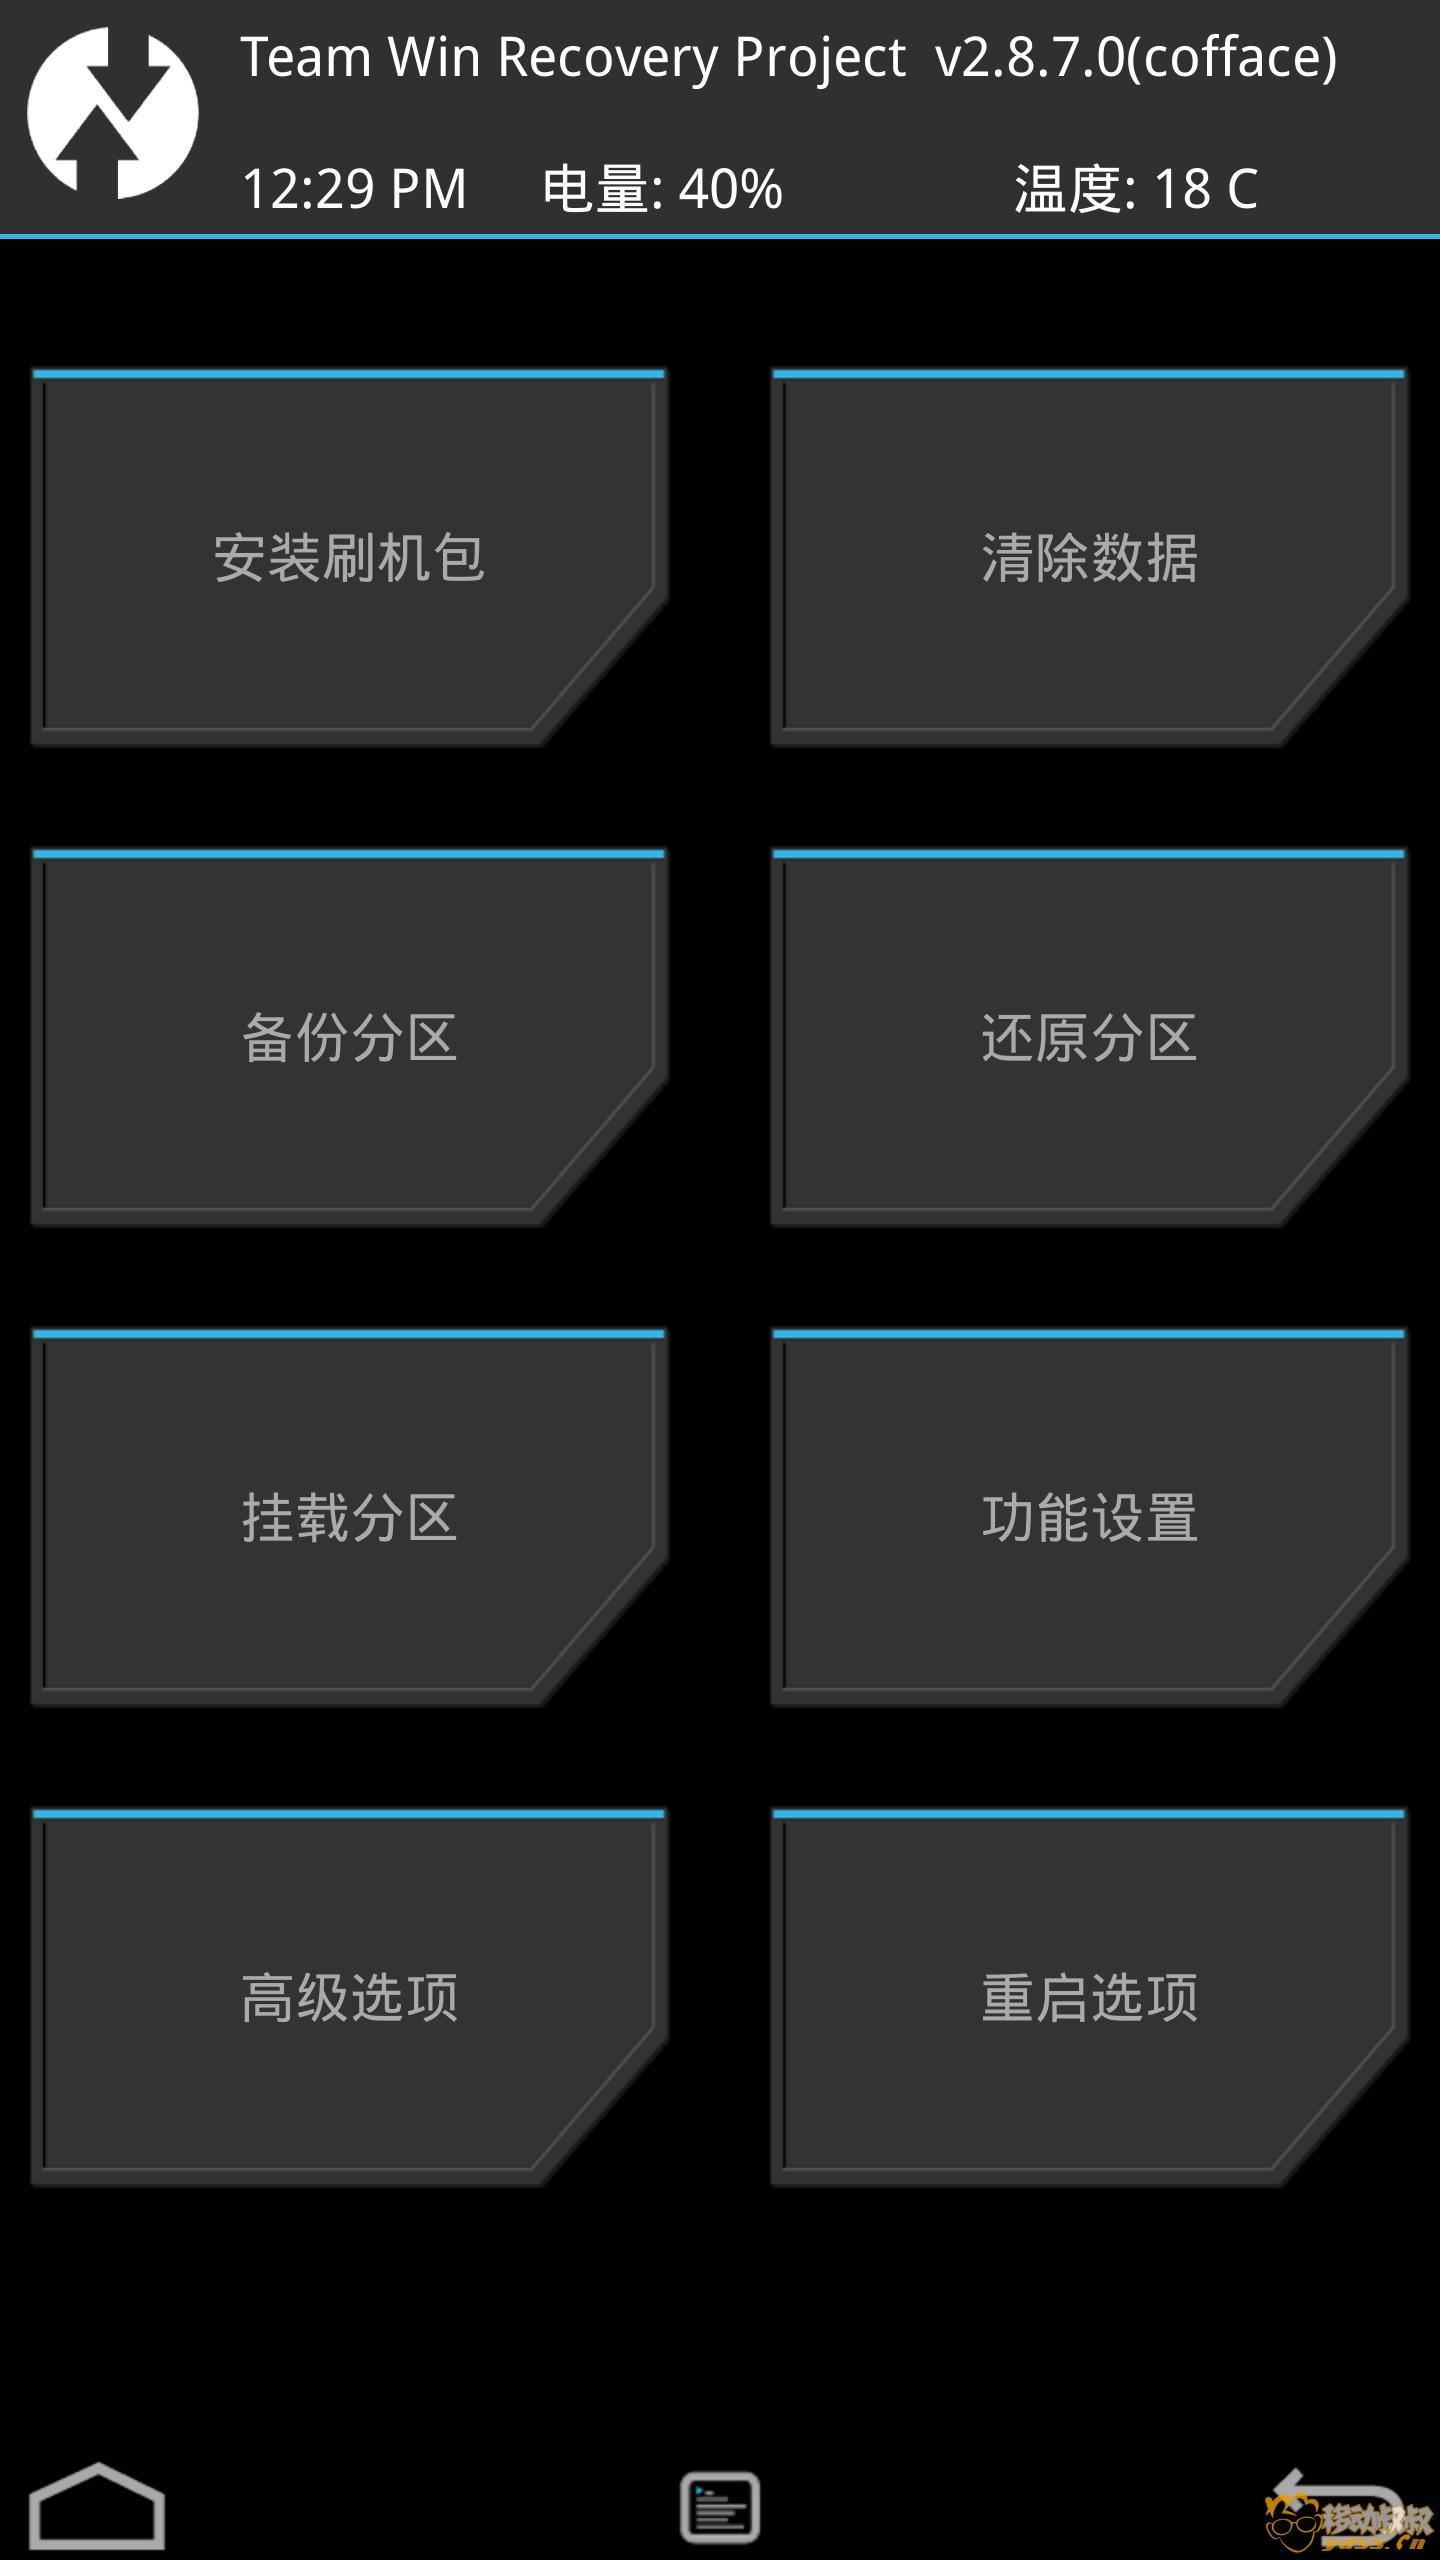 Screenshot_2017-01-06-12-29-25.png